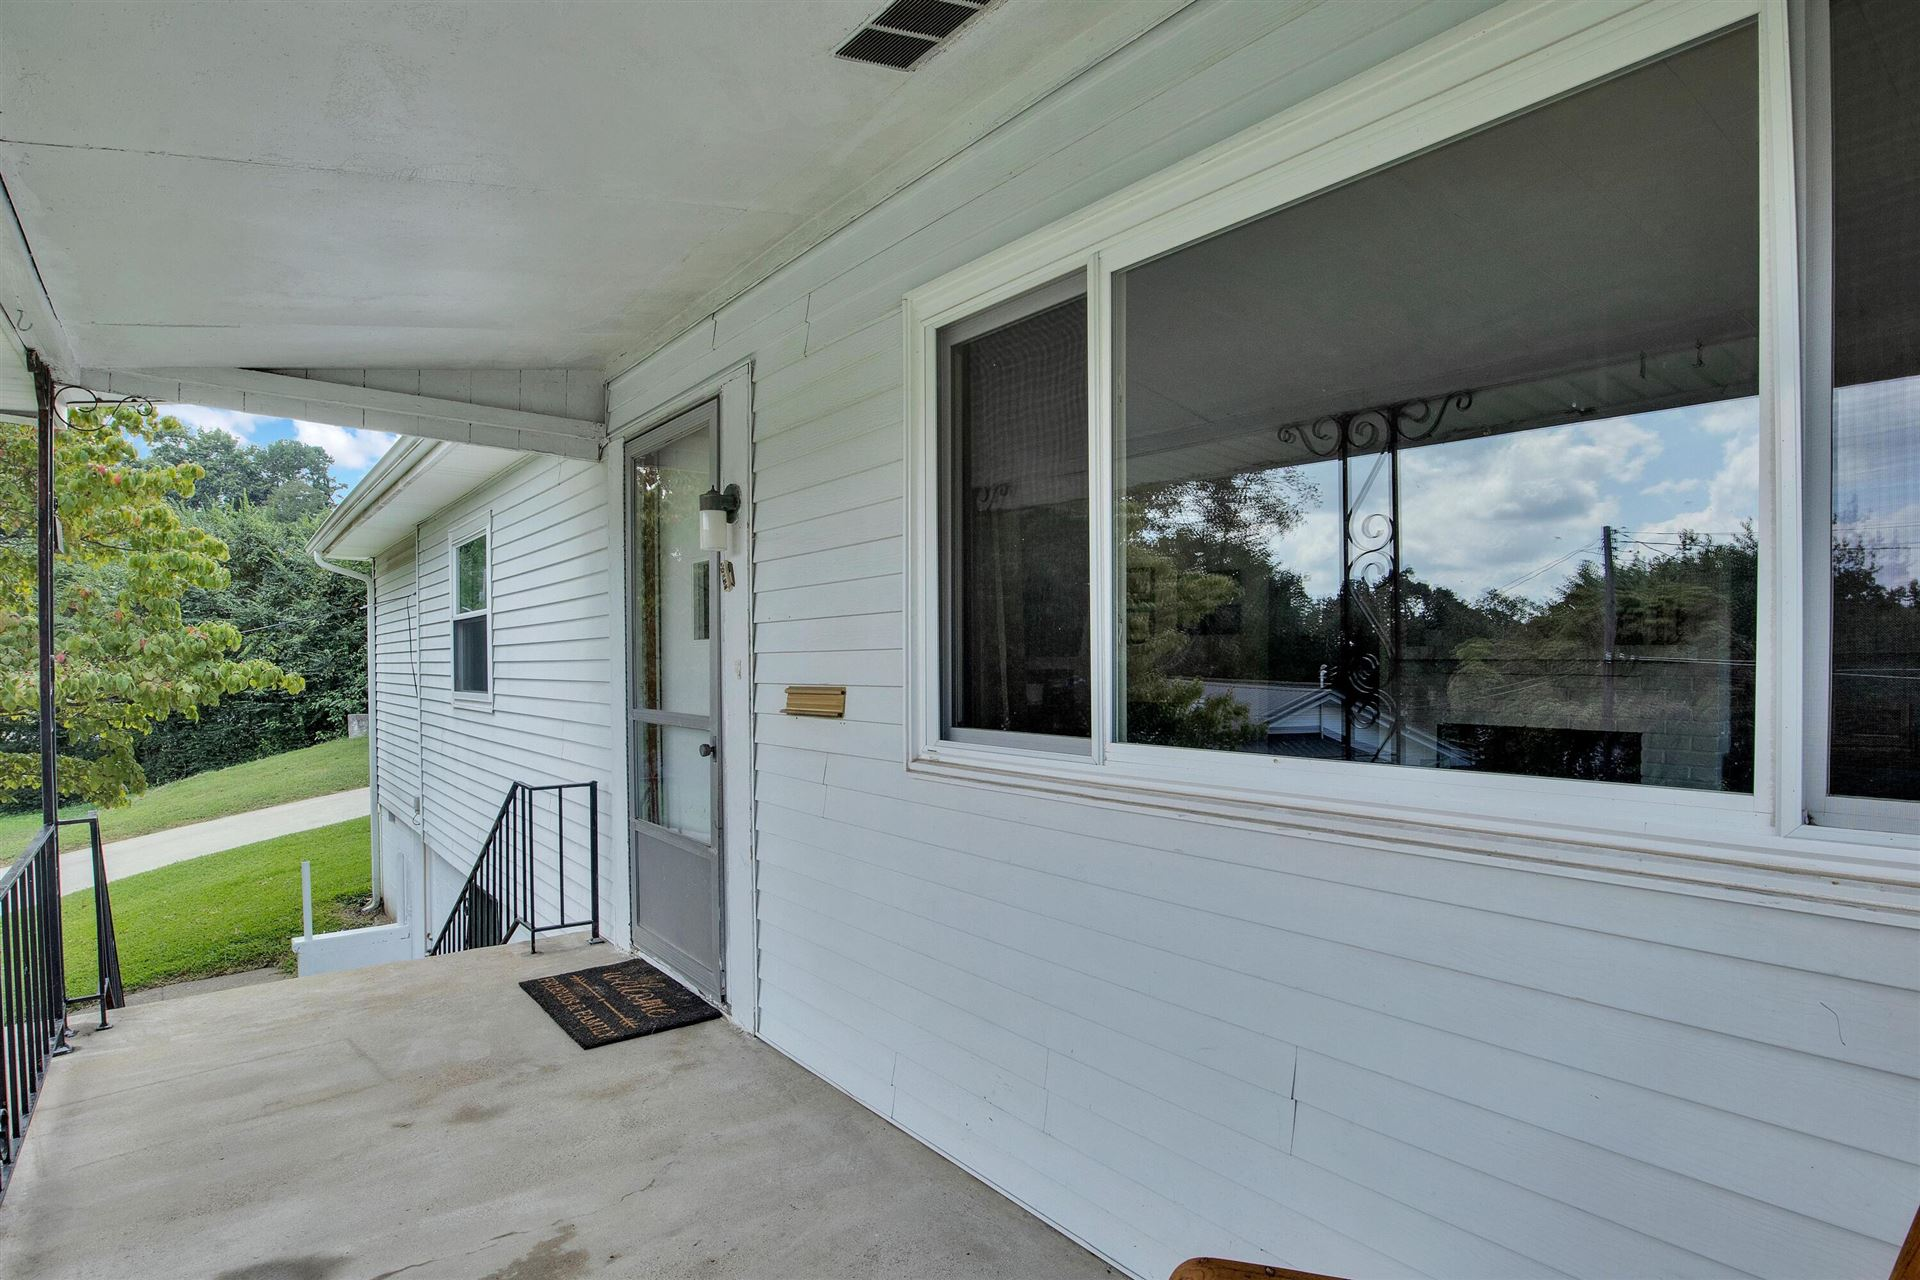 Photo of 102 Kimball Lane, Oak Ridge, TN 37830 (MLS # 1167049)